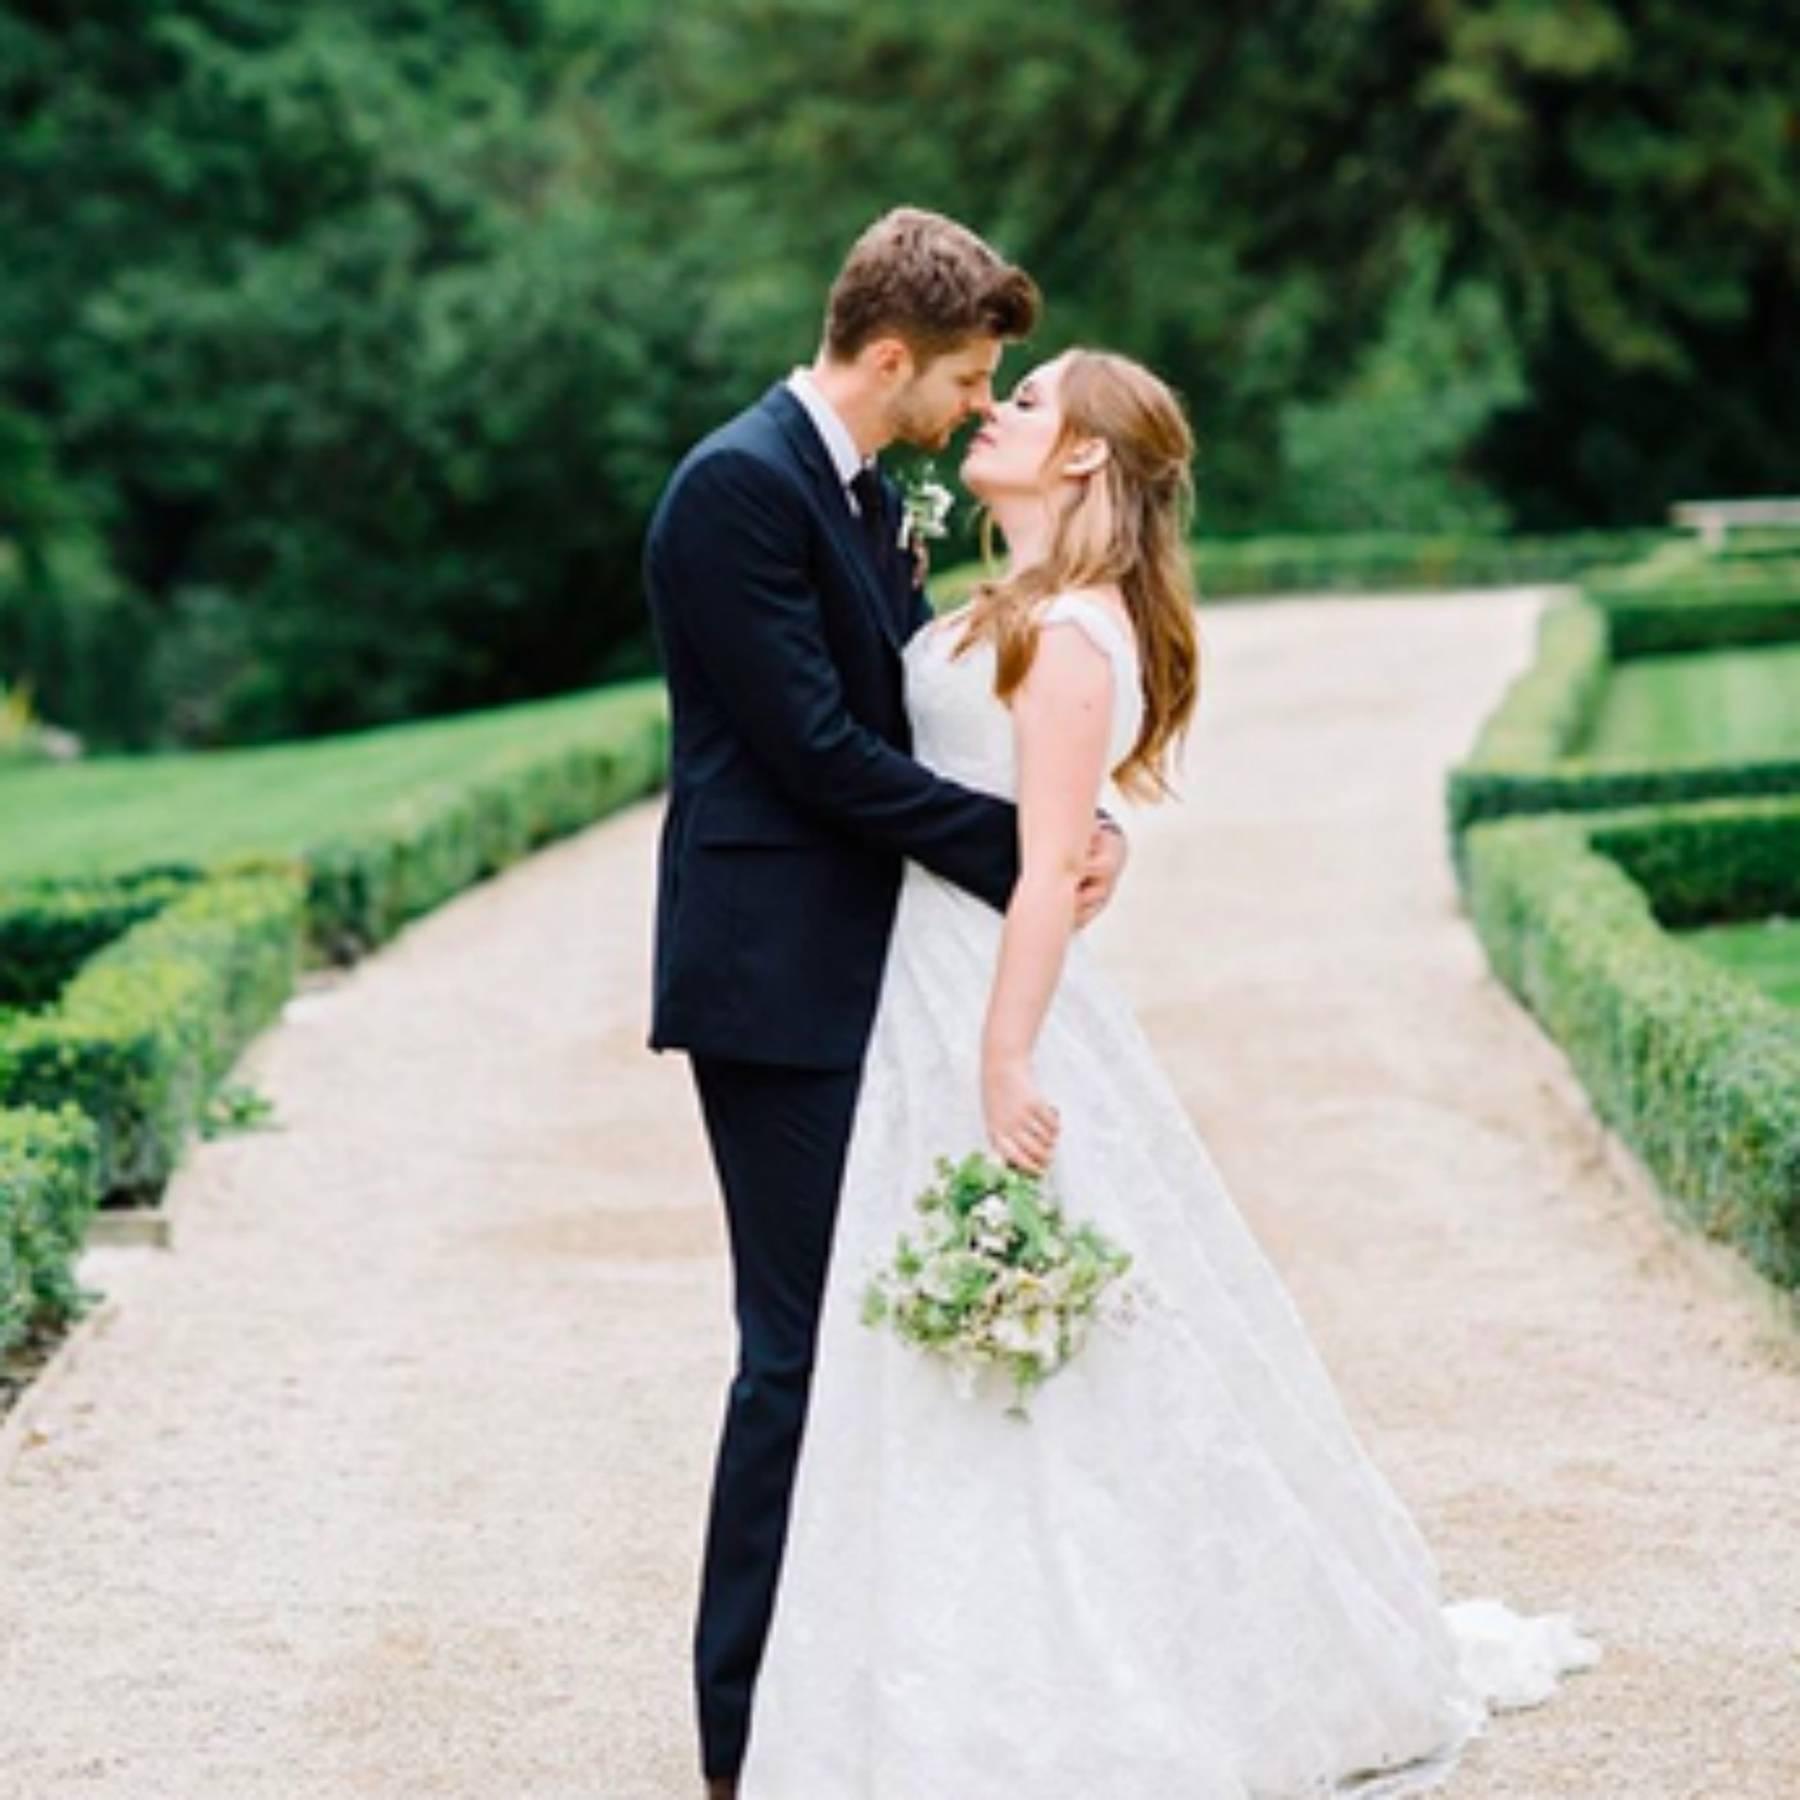 Tanya Burr Wedding To Jim Chapman   Dress, Guests & Pictures